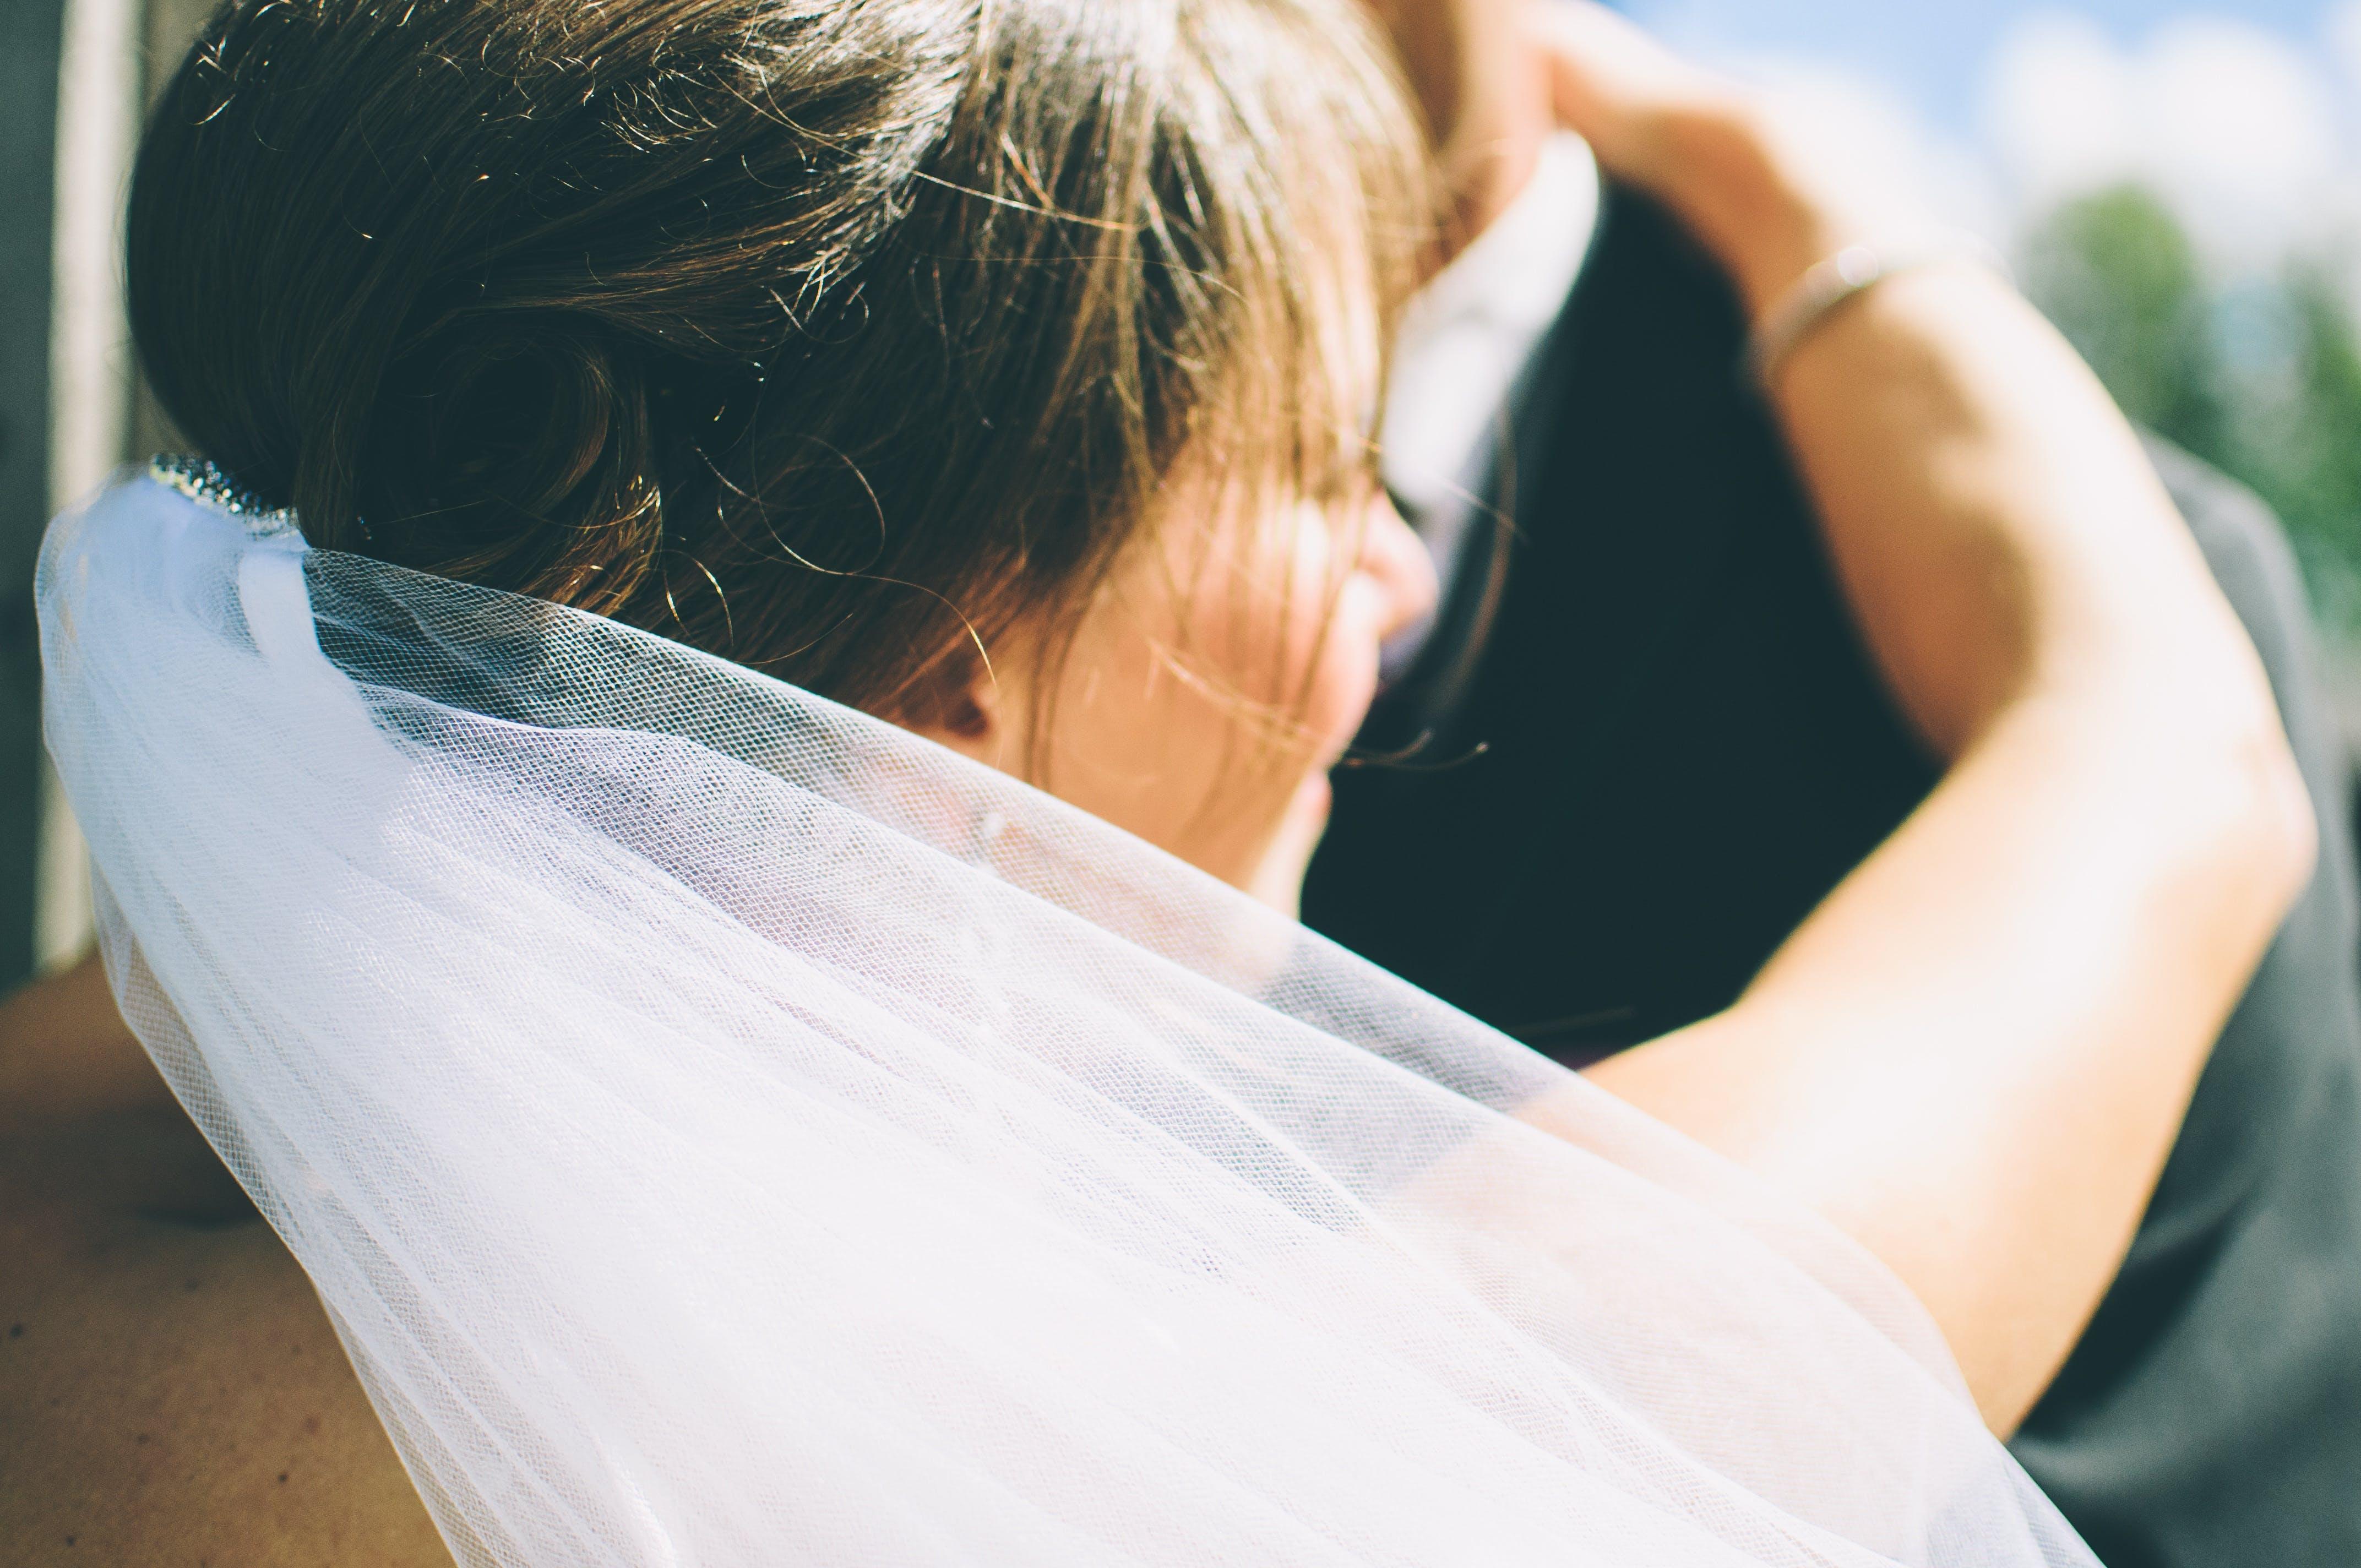 Bride Dancing With Groom in Black Suit Jacket